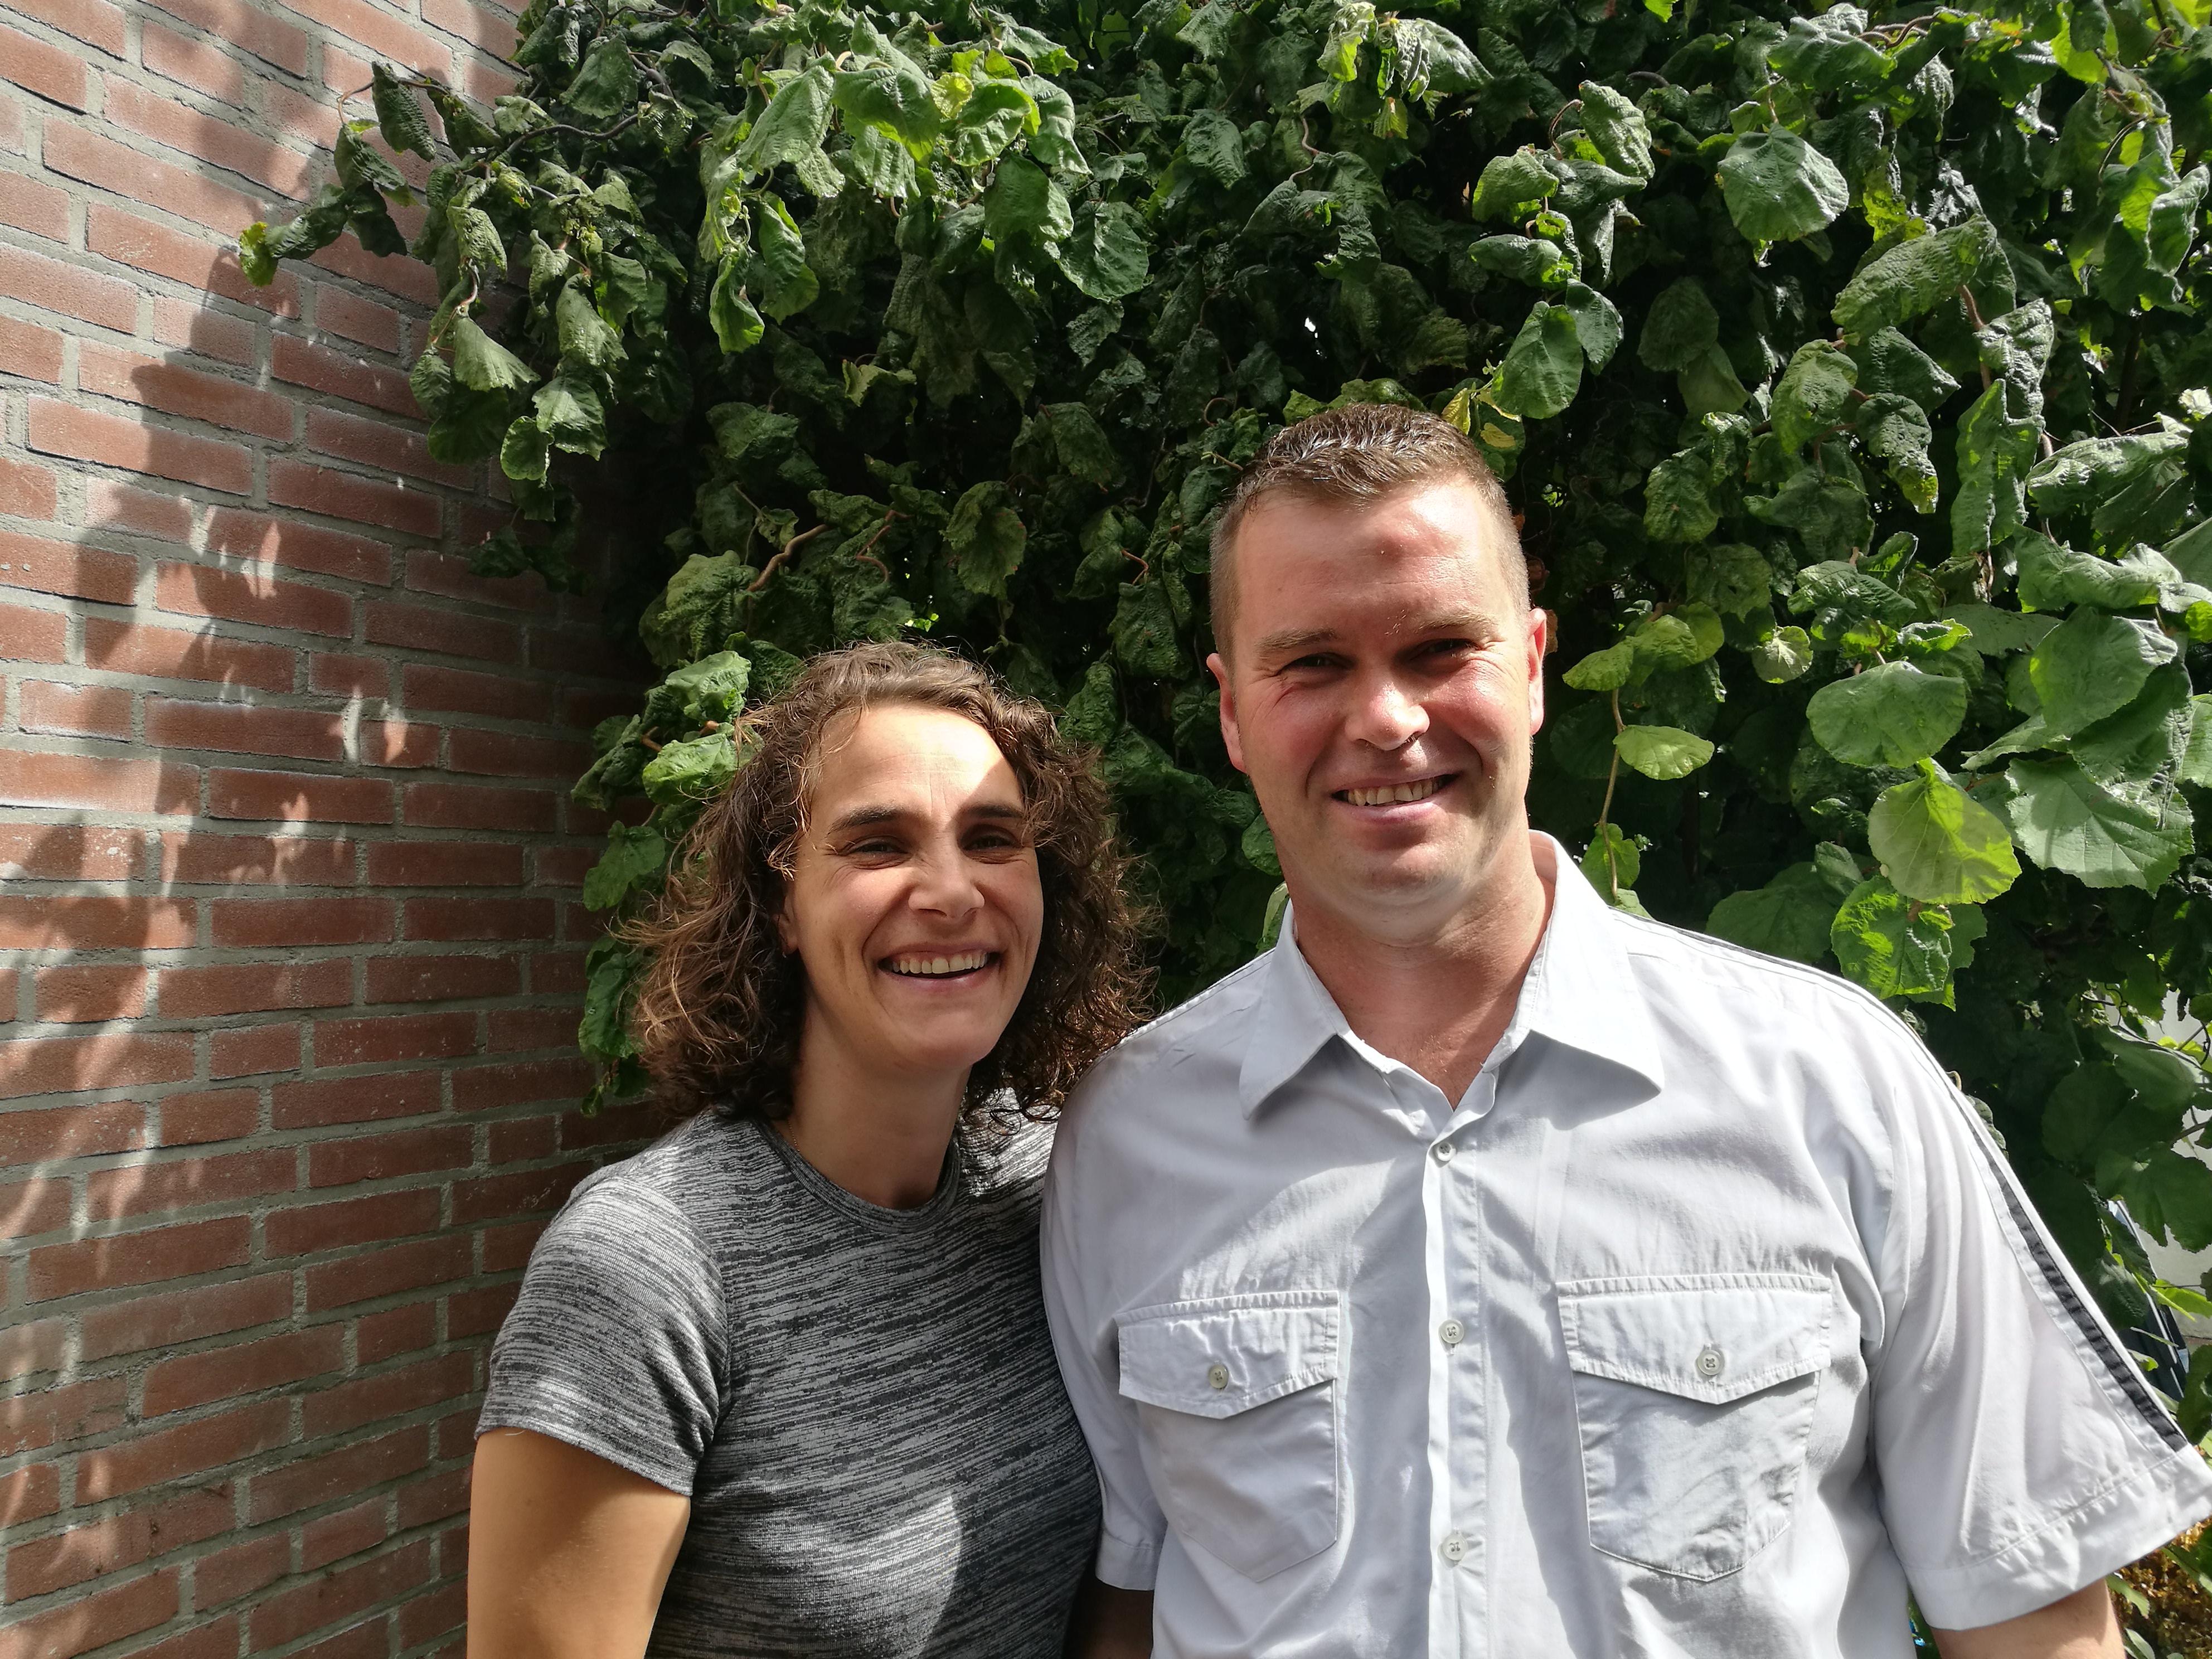 Willeanne Kager-Swanink en André Kager casual bij plant en boom